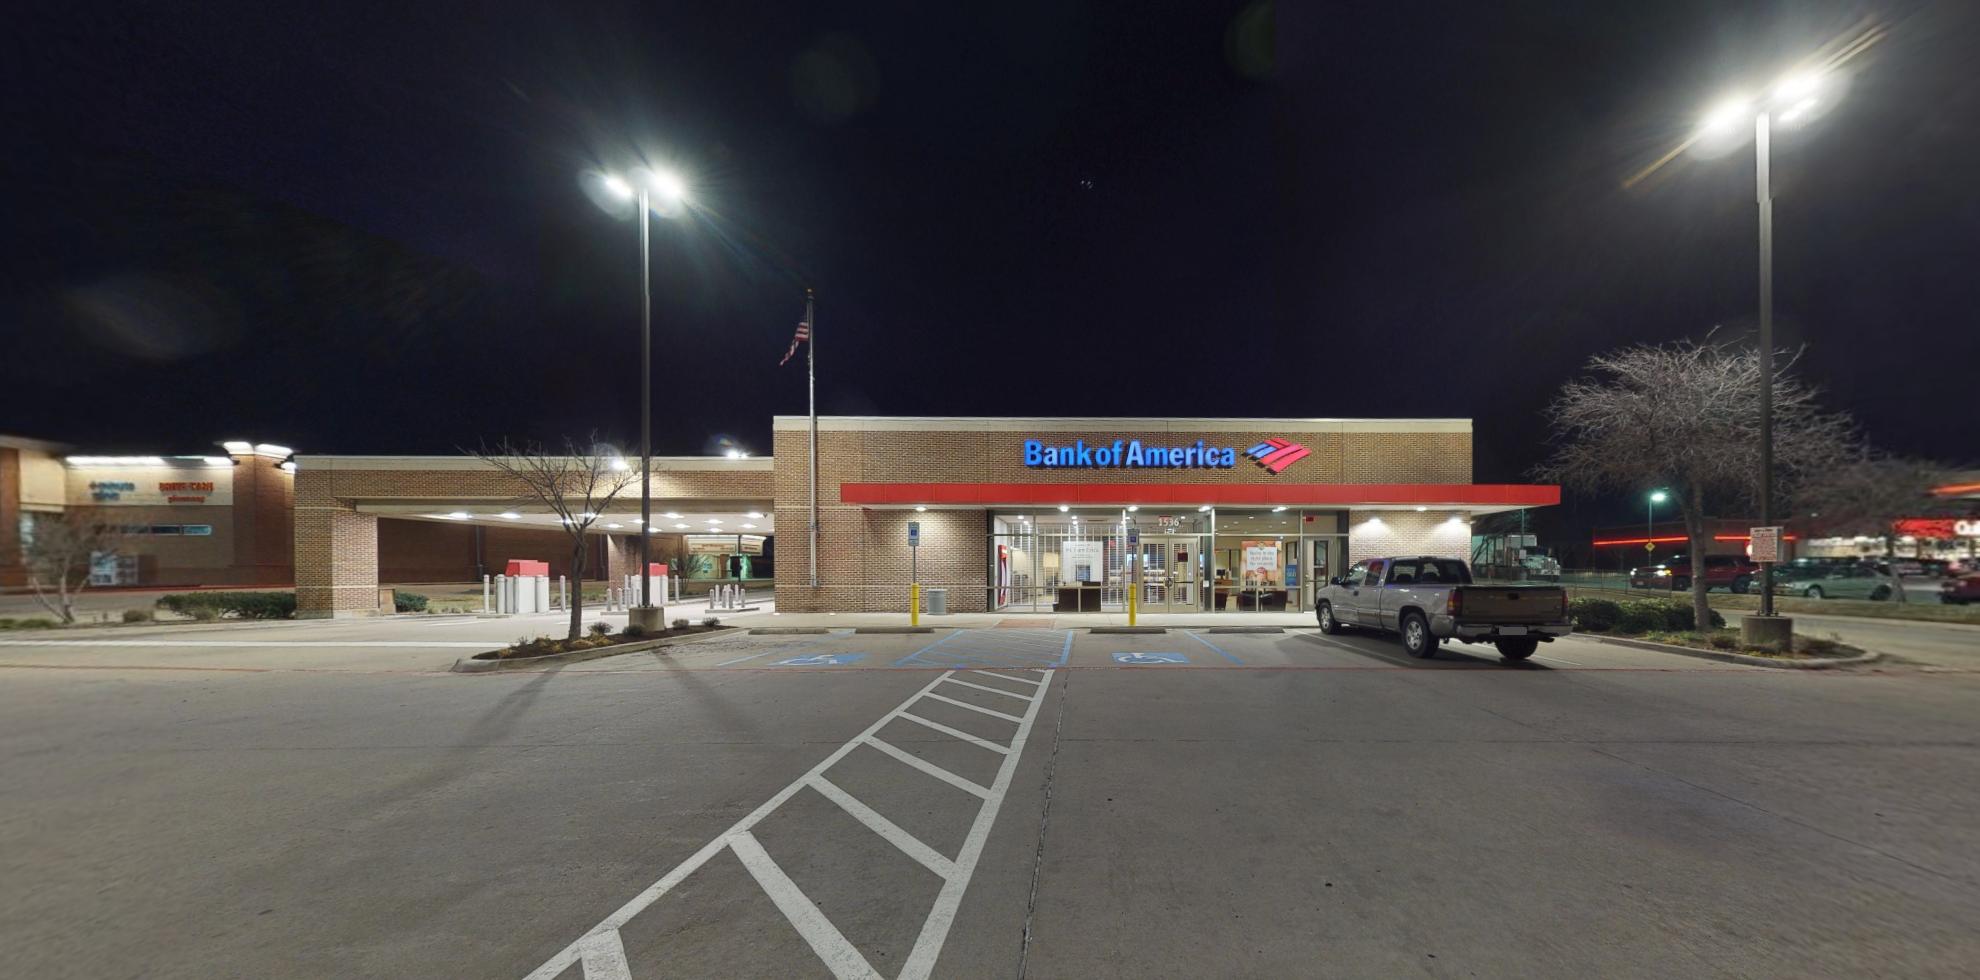 Bank of America financial center with drive-thru ATM | 1536 W Hebron Pkwy, Carrollton, TX 75010